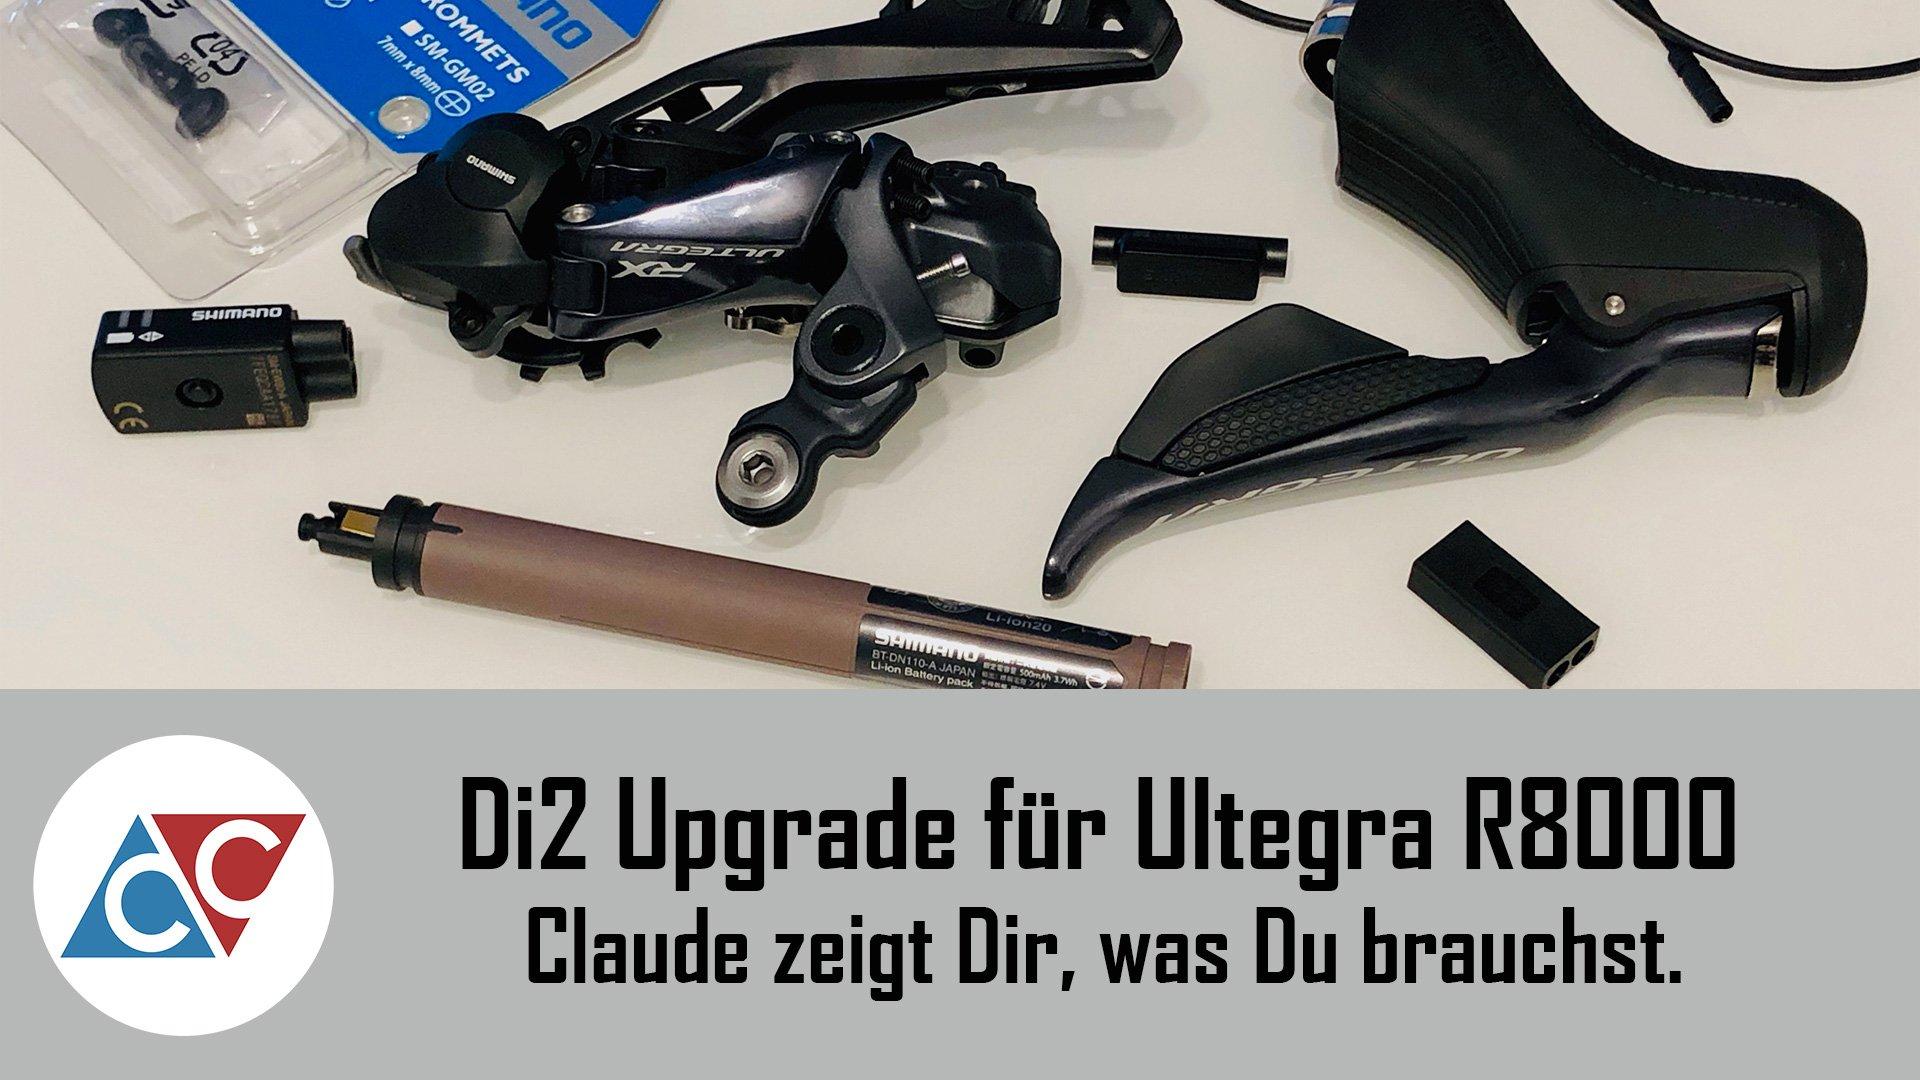 Ultegra R8000 Di2 Upgrade